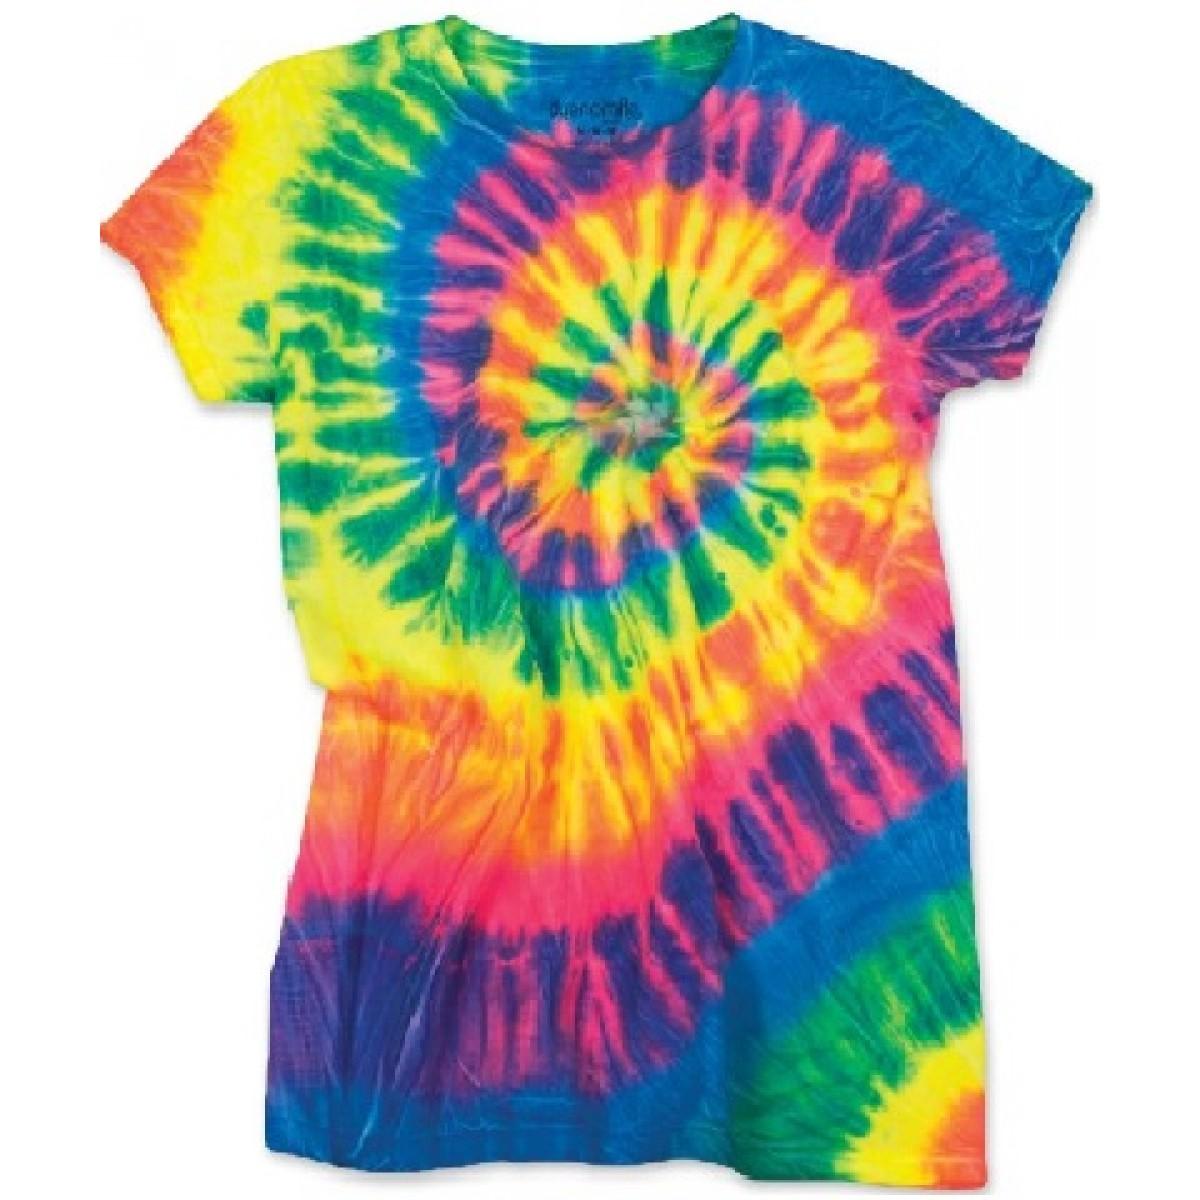 Spiral Tie Dye T-Shirt Flo Rainbow-Rainbow-XL